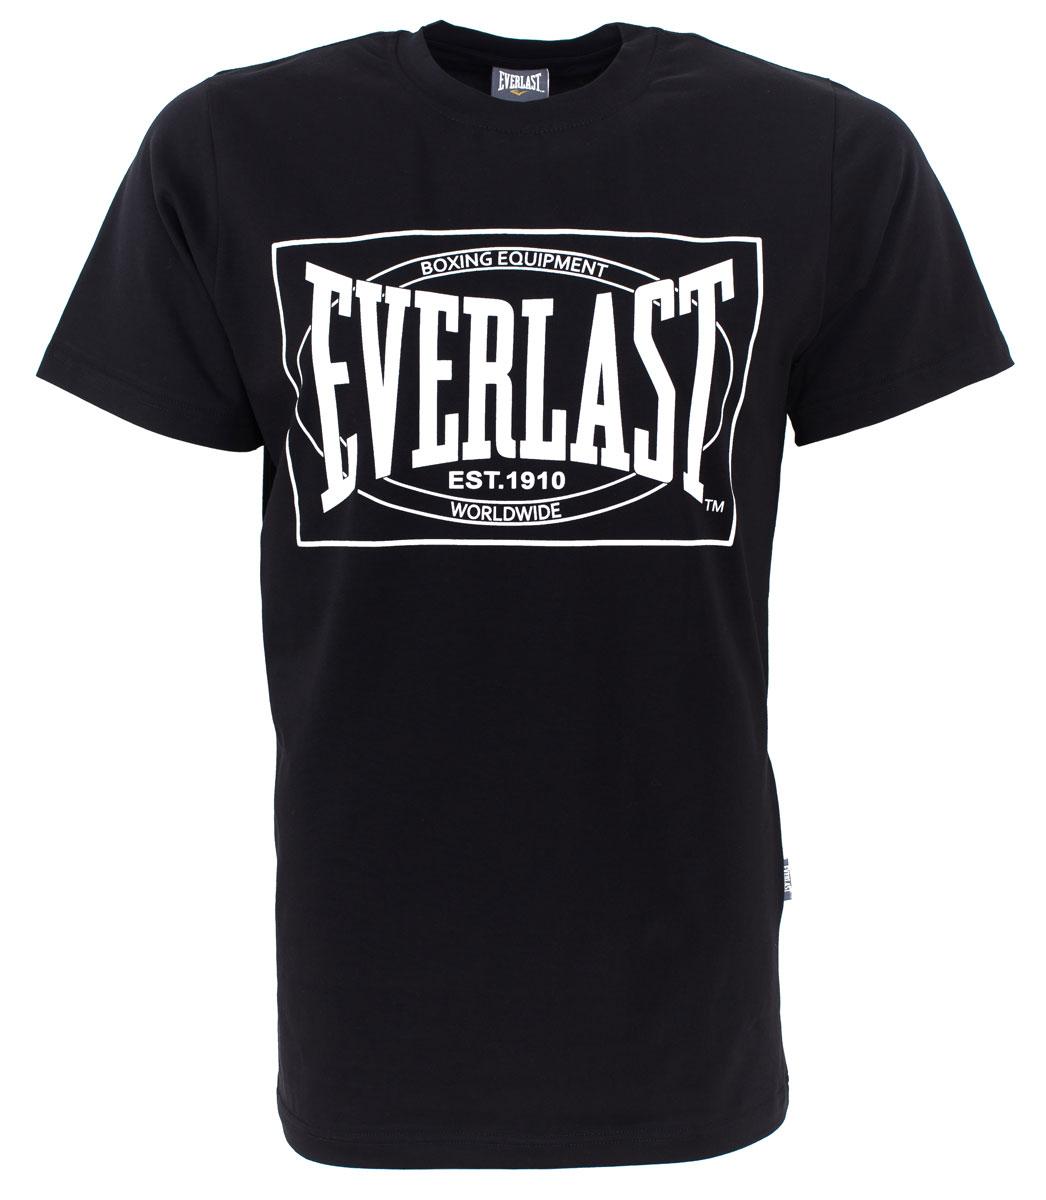 Футболка мужская Everlast Choice of Champions, цвет: черный. RE0033. Размер XXL (54/56) футболка мужская mitre цвет желтый tt29019 размер xxl 54 56